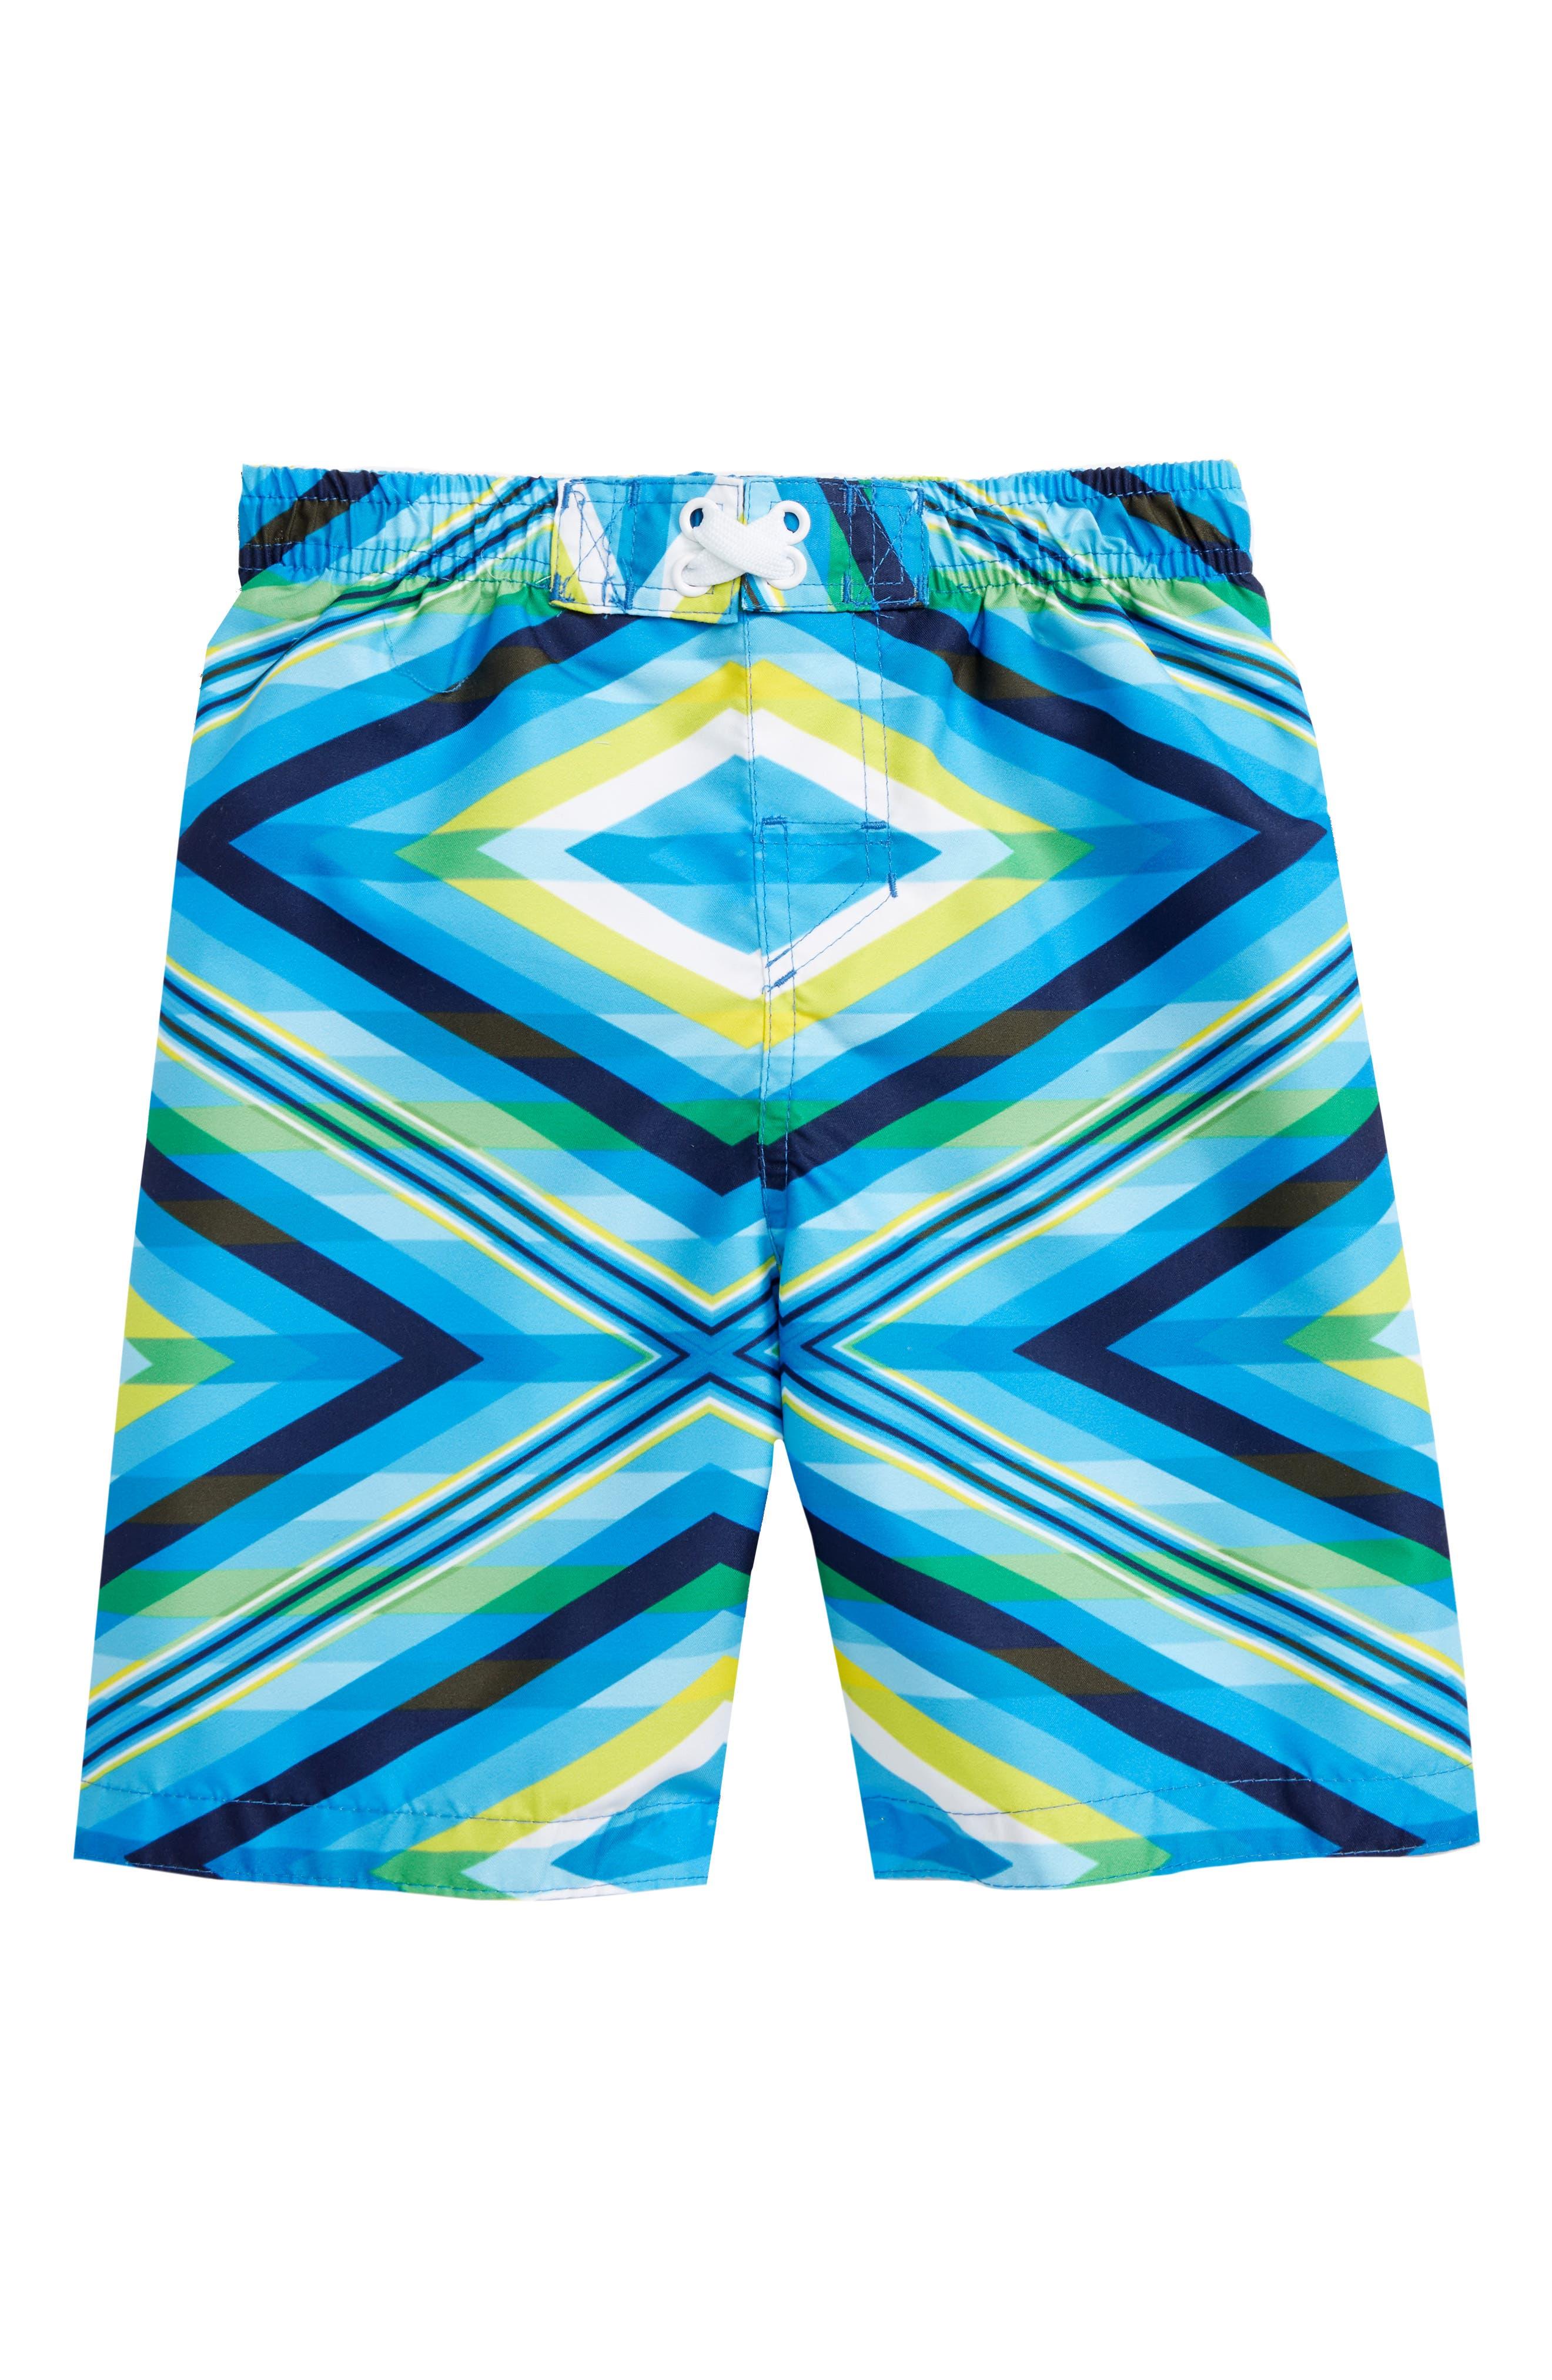 Geo Mirage Swim Trunks,                             Main thumbnail 1, color,                             Blue/ Yellow